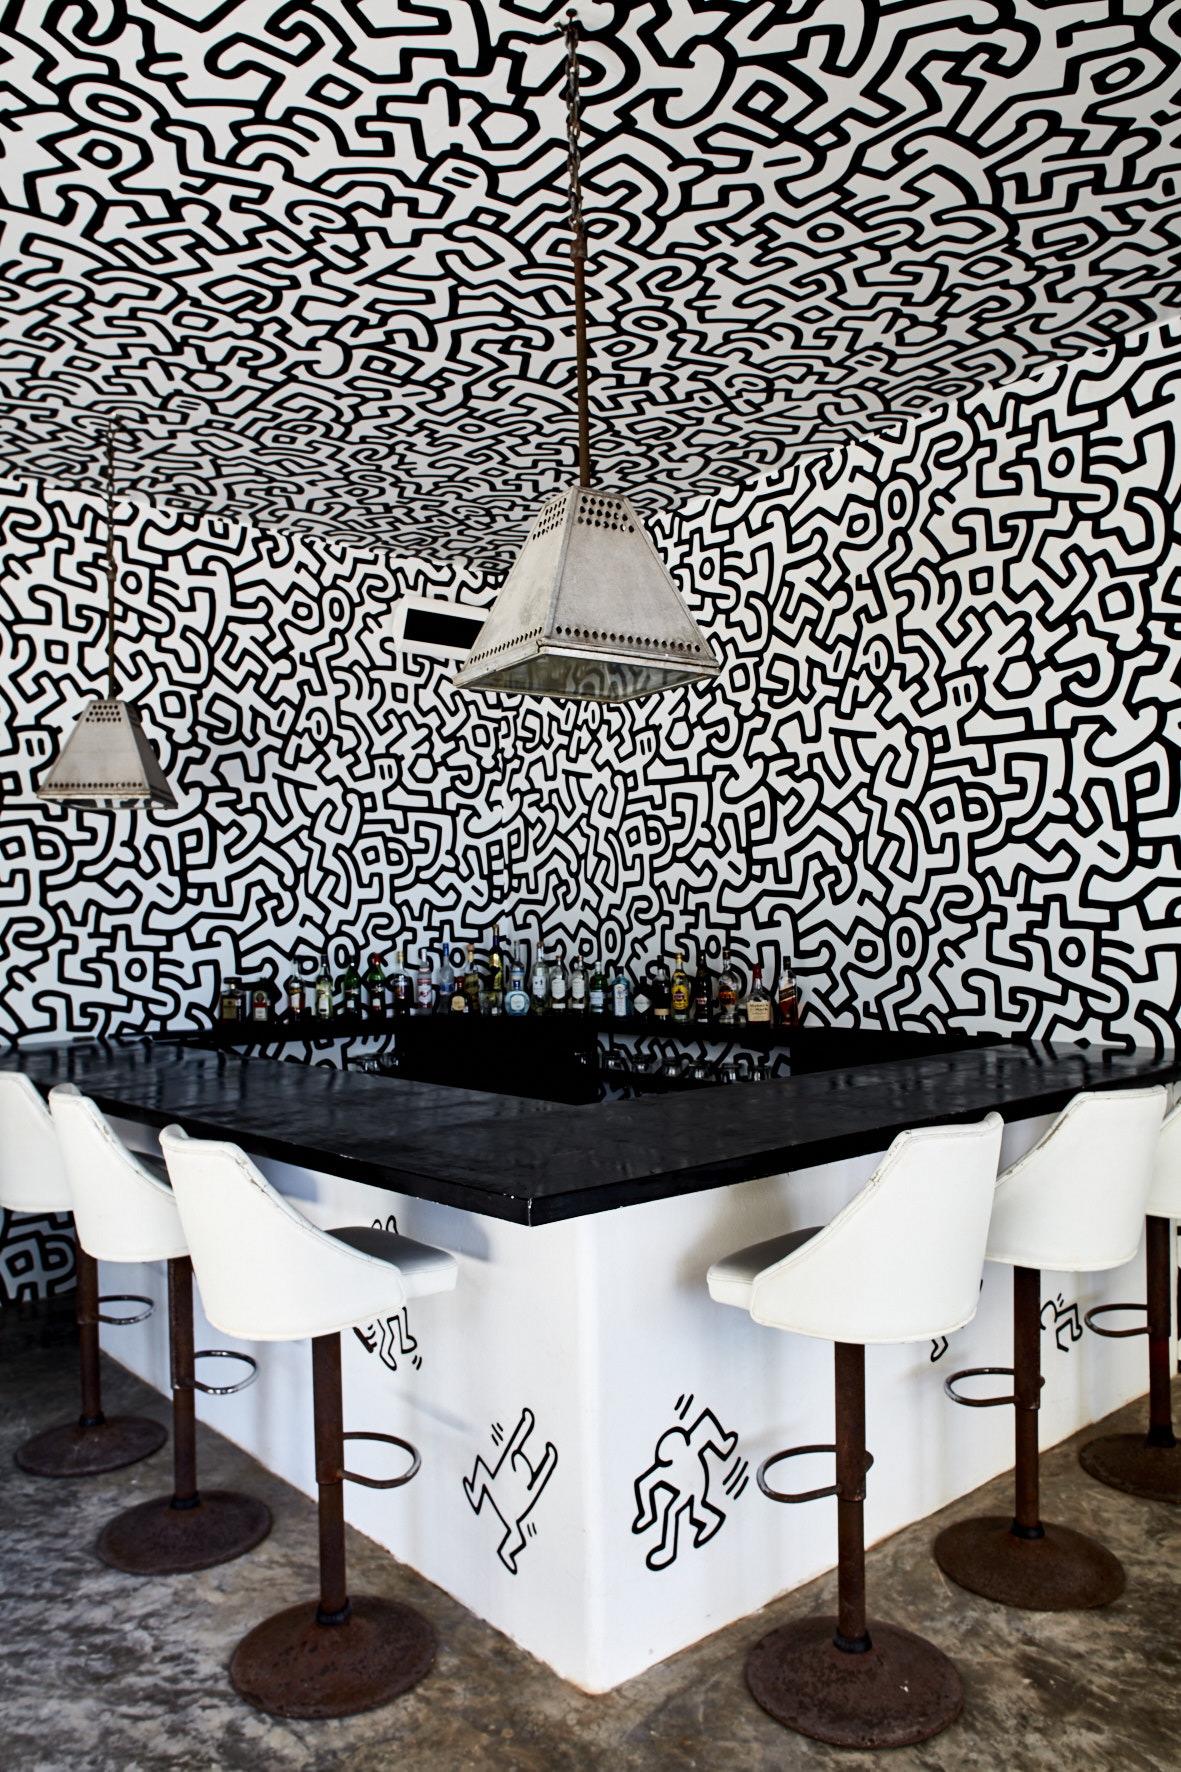 Keith Haring wallpaper in the bar @ Casa Malca